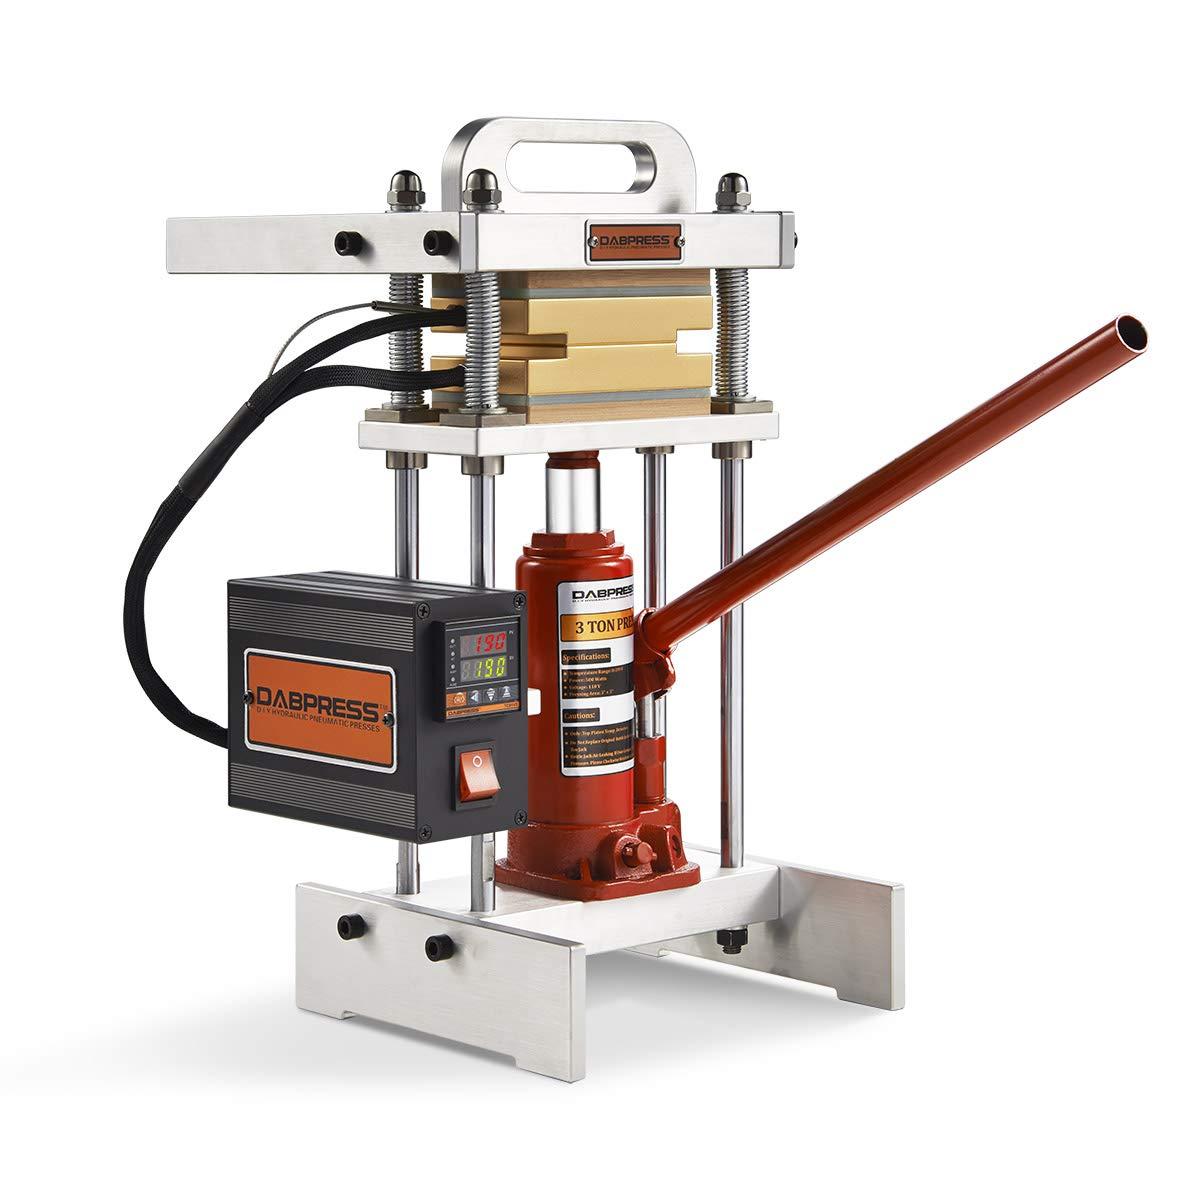 3 Ton Hydraulic Jack Heat Press - dp-bj3t33-3x3 Inch Anodized Heat Press Plates - 500 Watts - Dual Heating Machine - Accurate Temp Detected by Dabpress